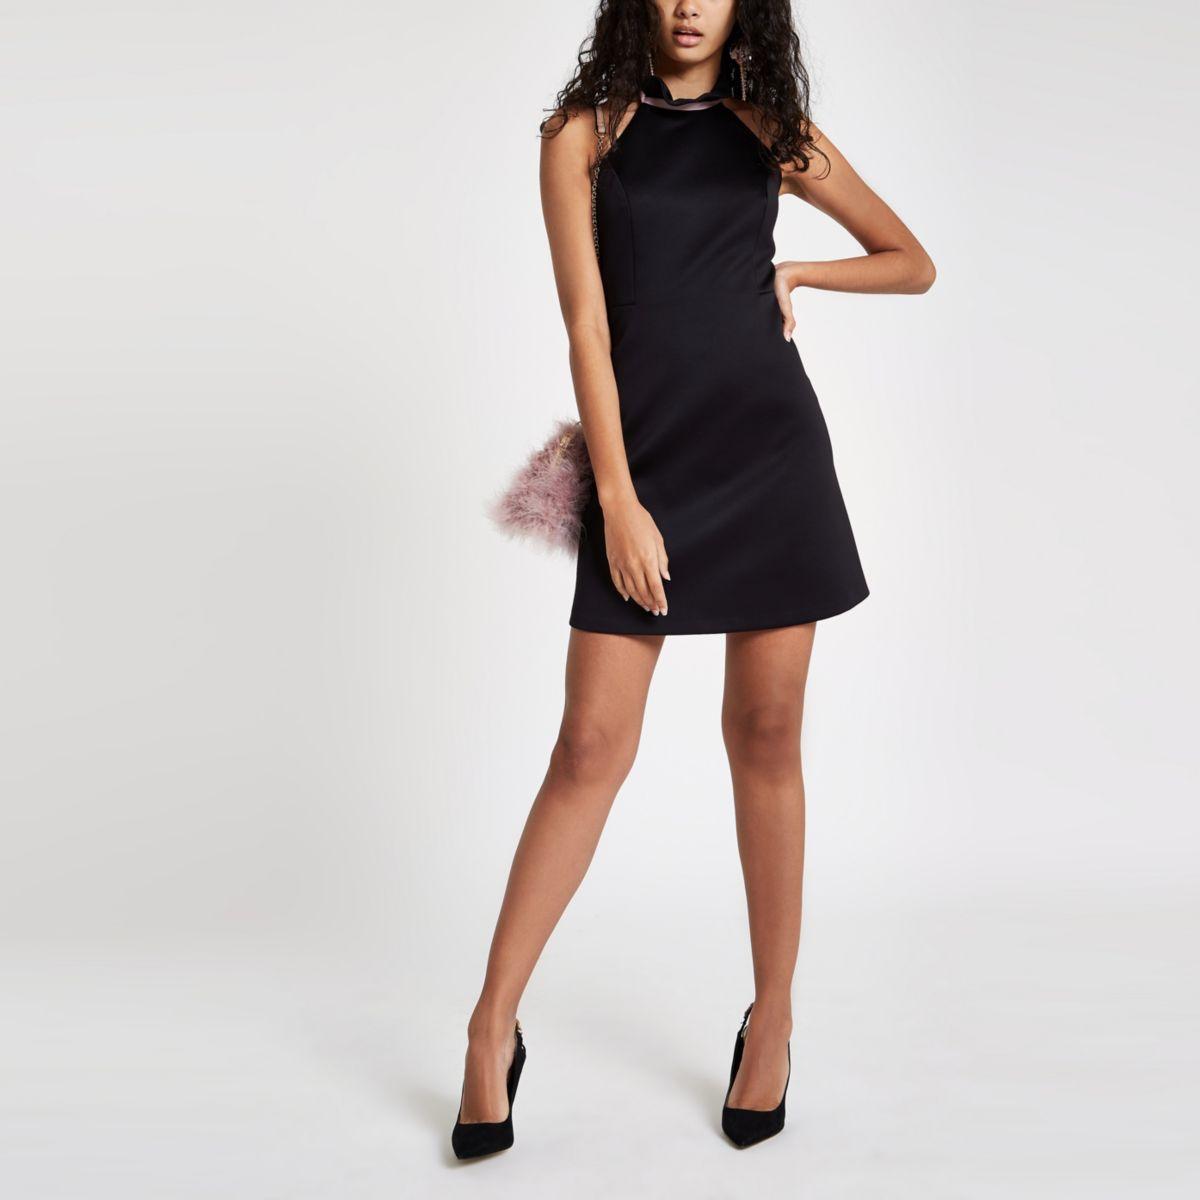 Black frill halter neck mini dress